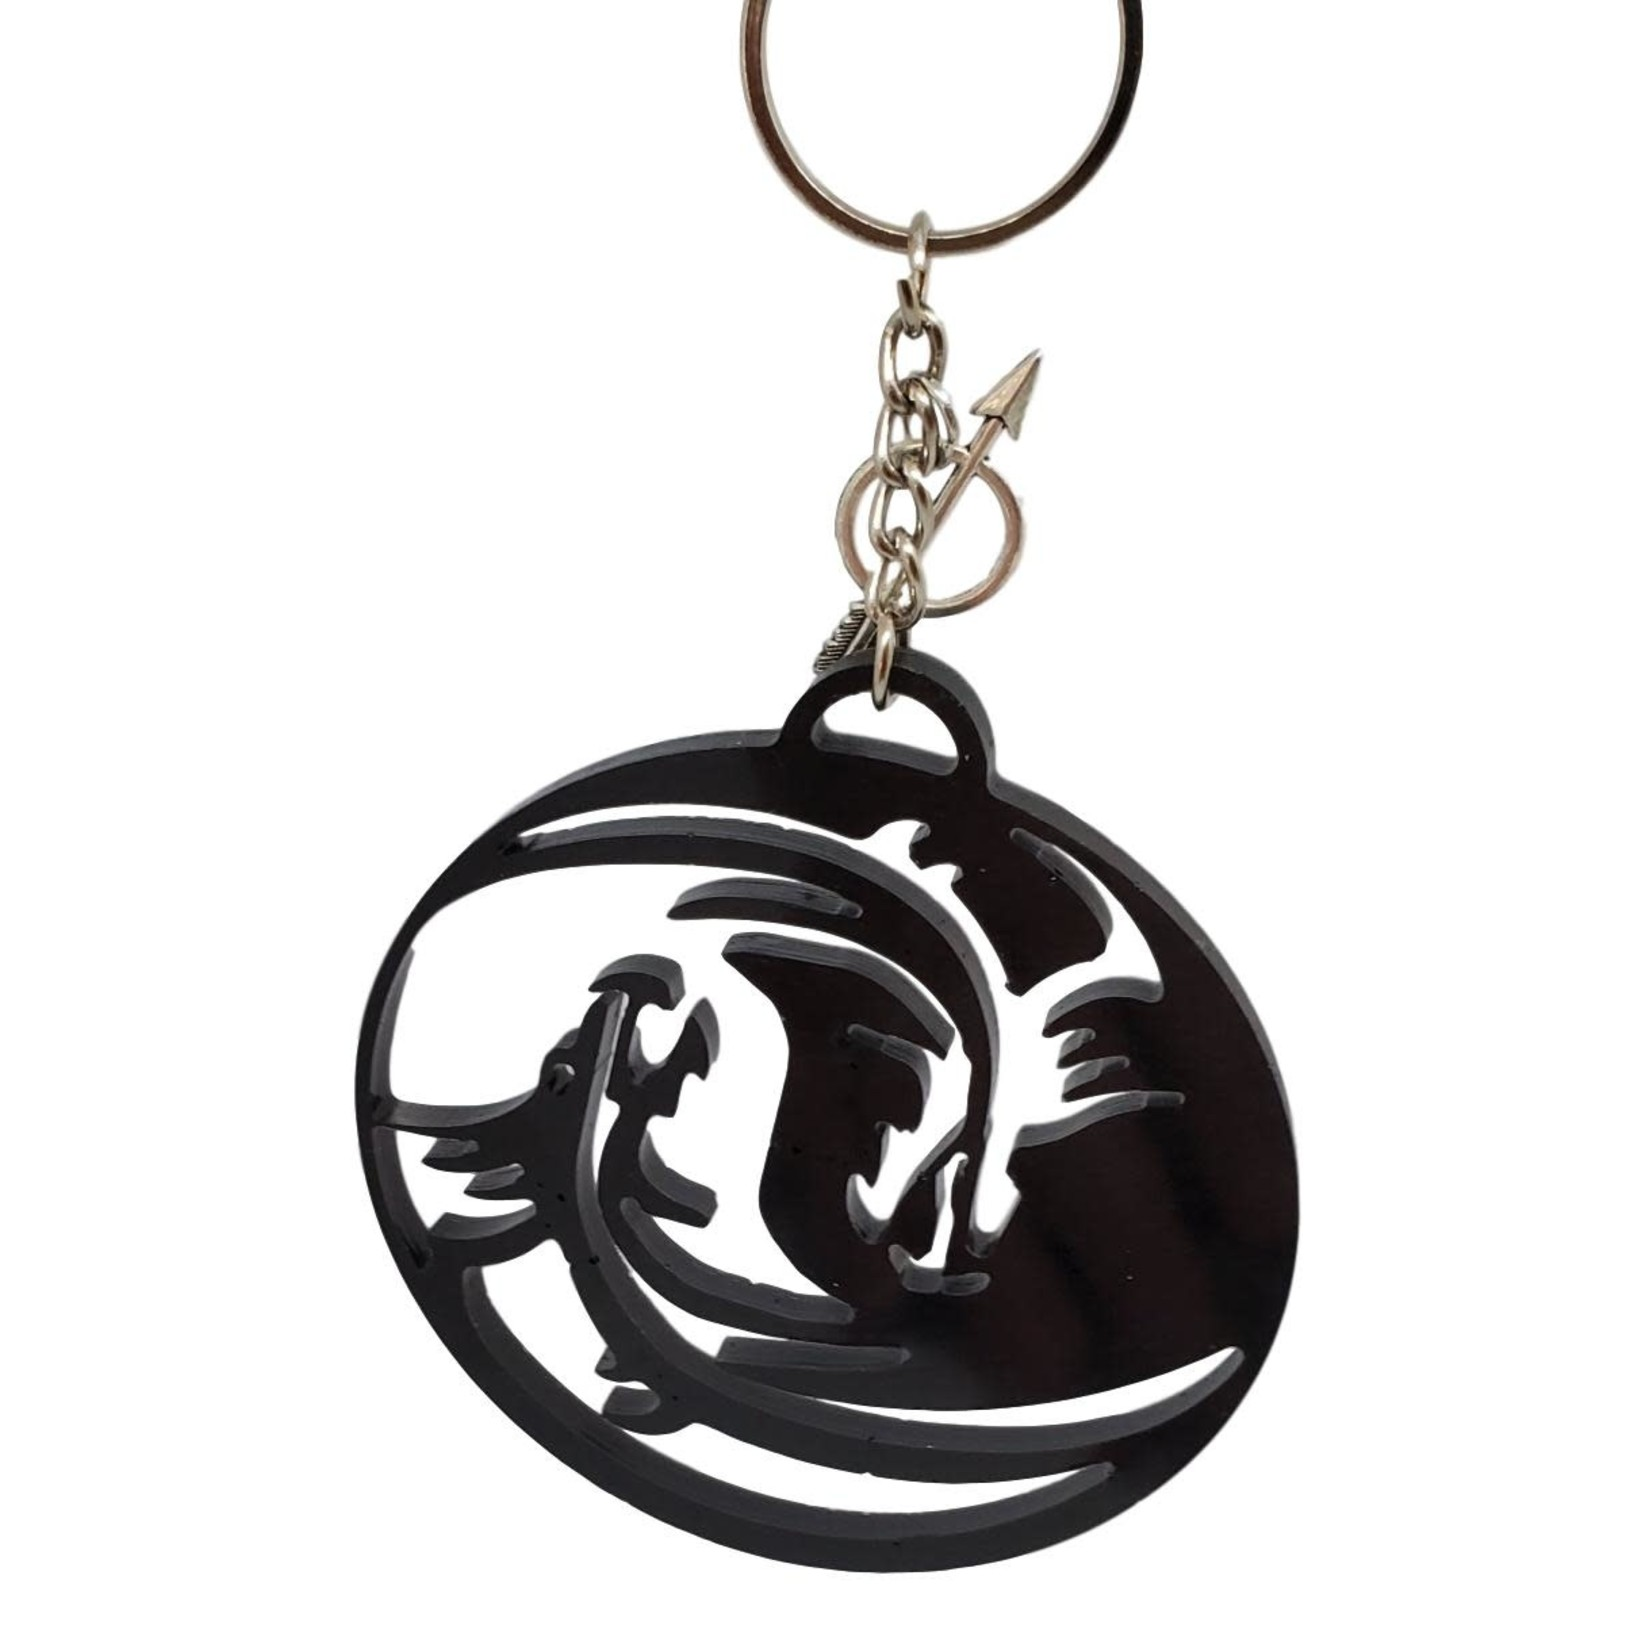 East Coast Sirens Dragon Art Key Chain in Black